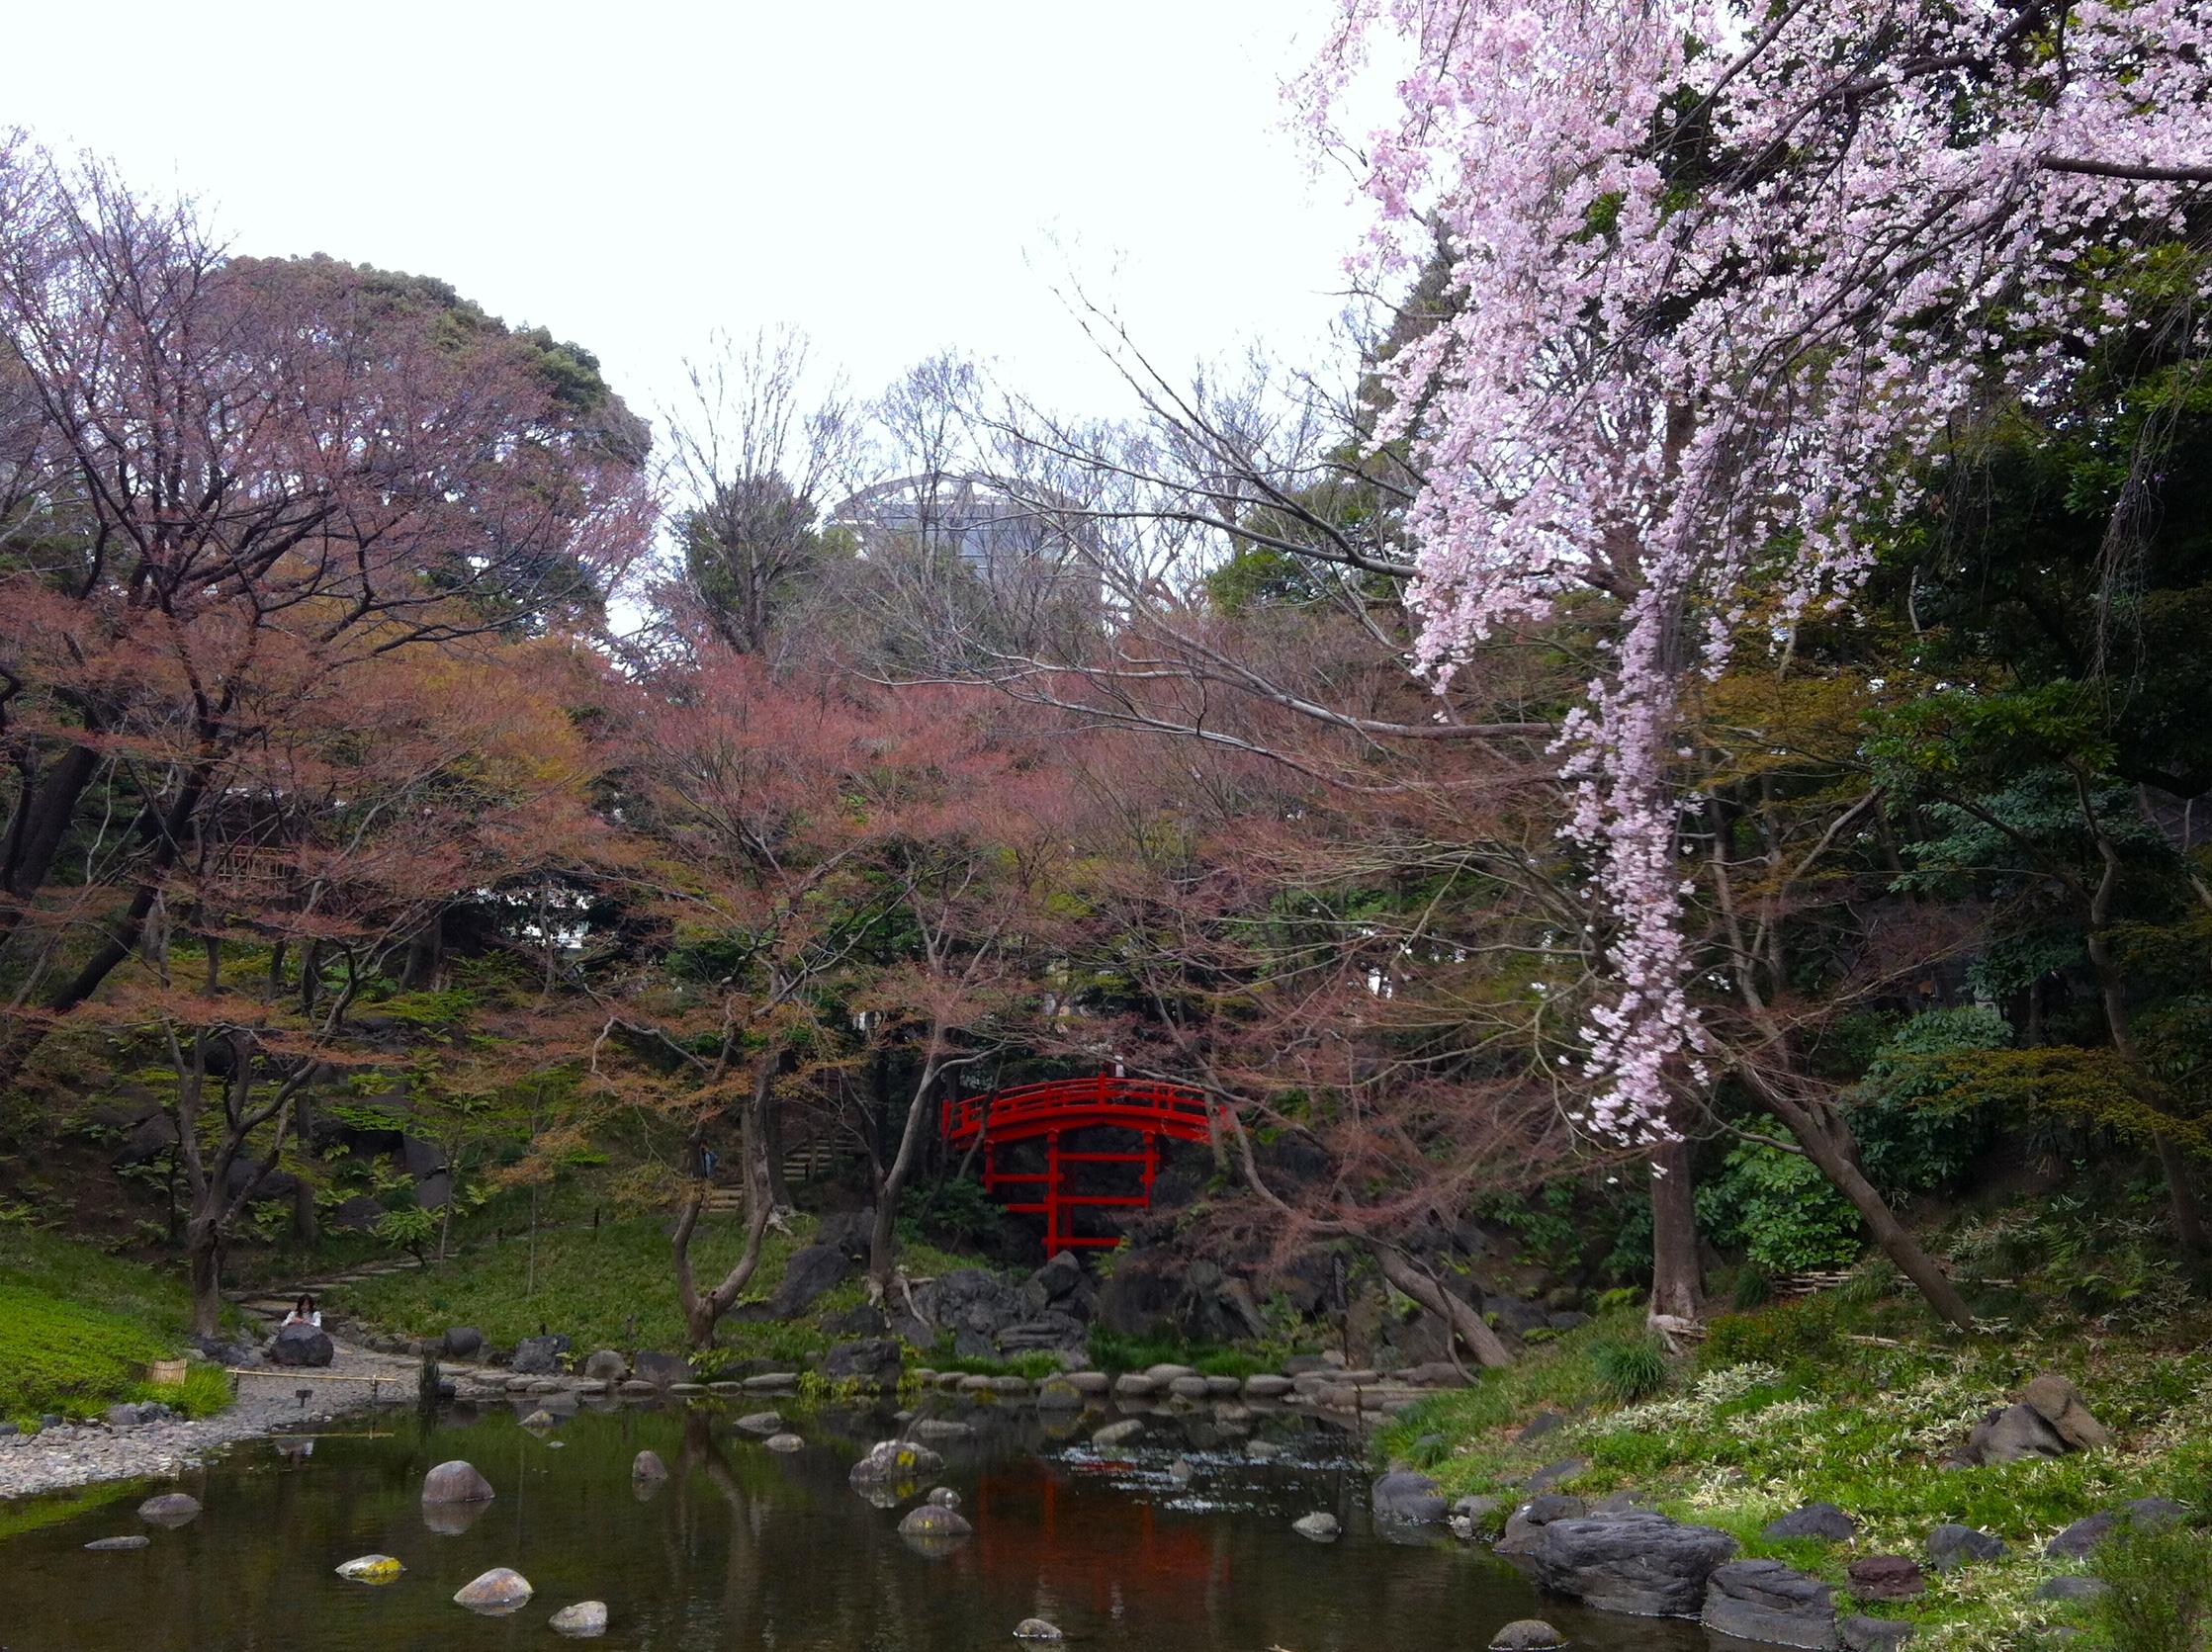 image gallery of japanese garden cherry blossom bridge